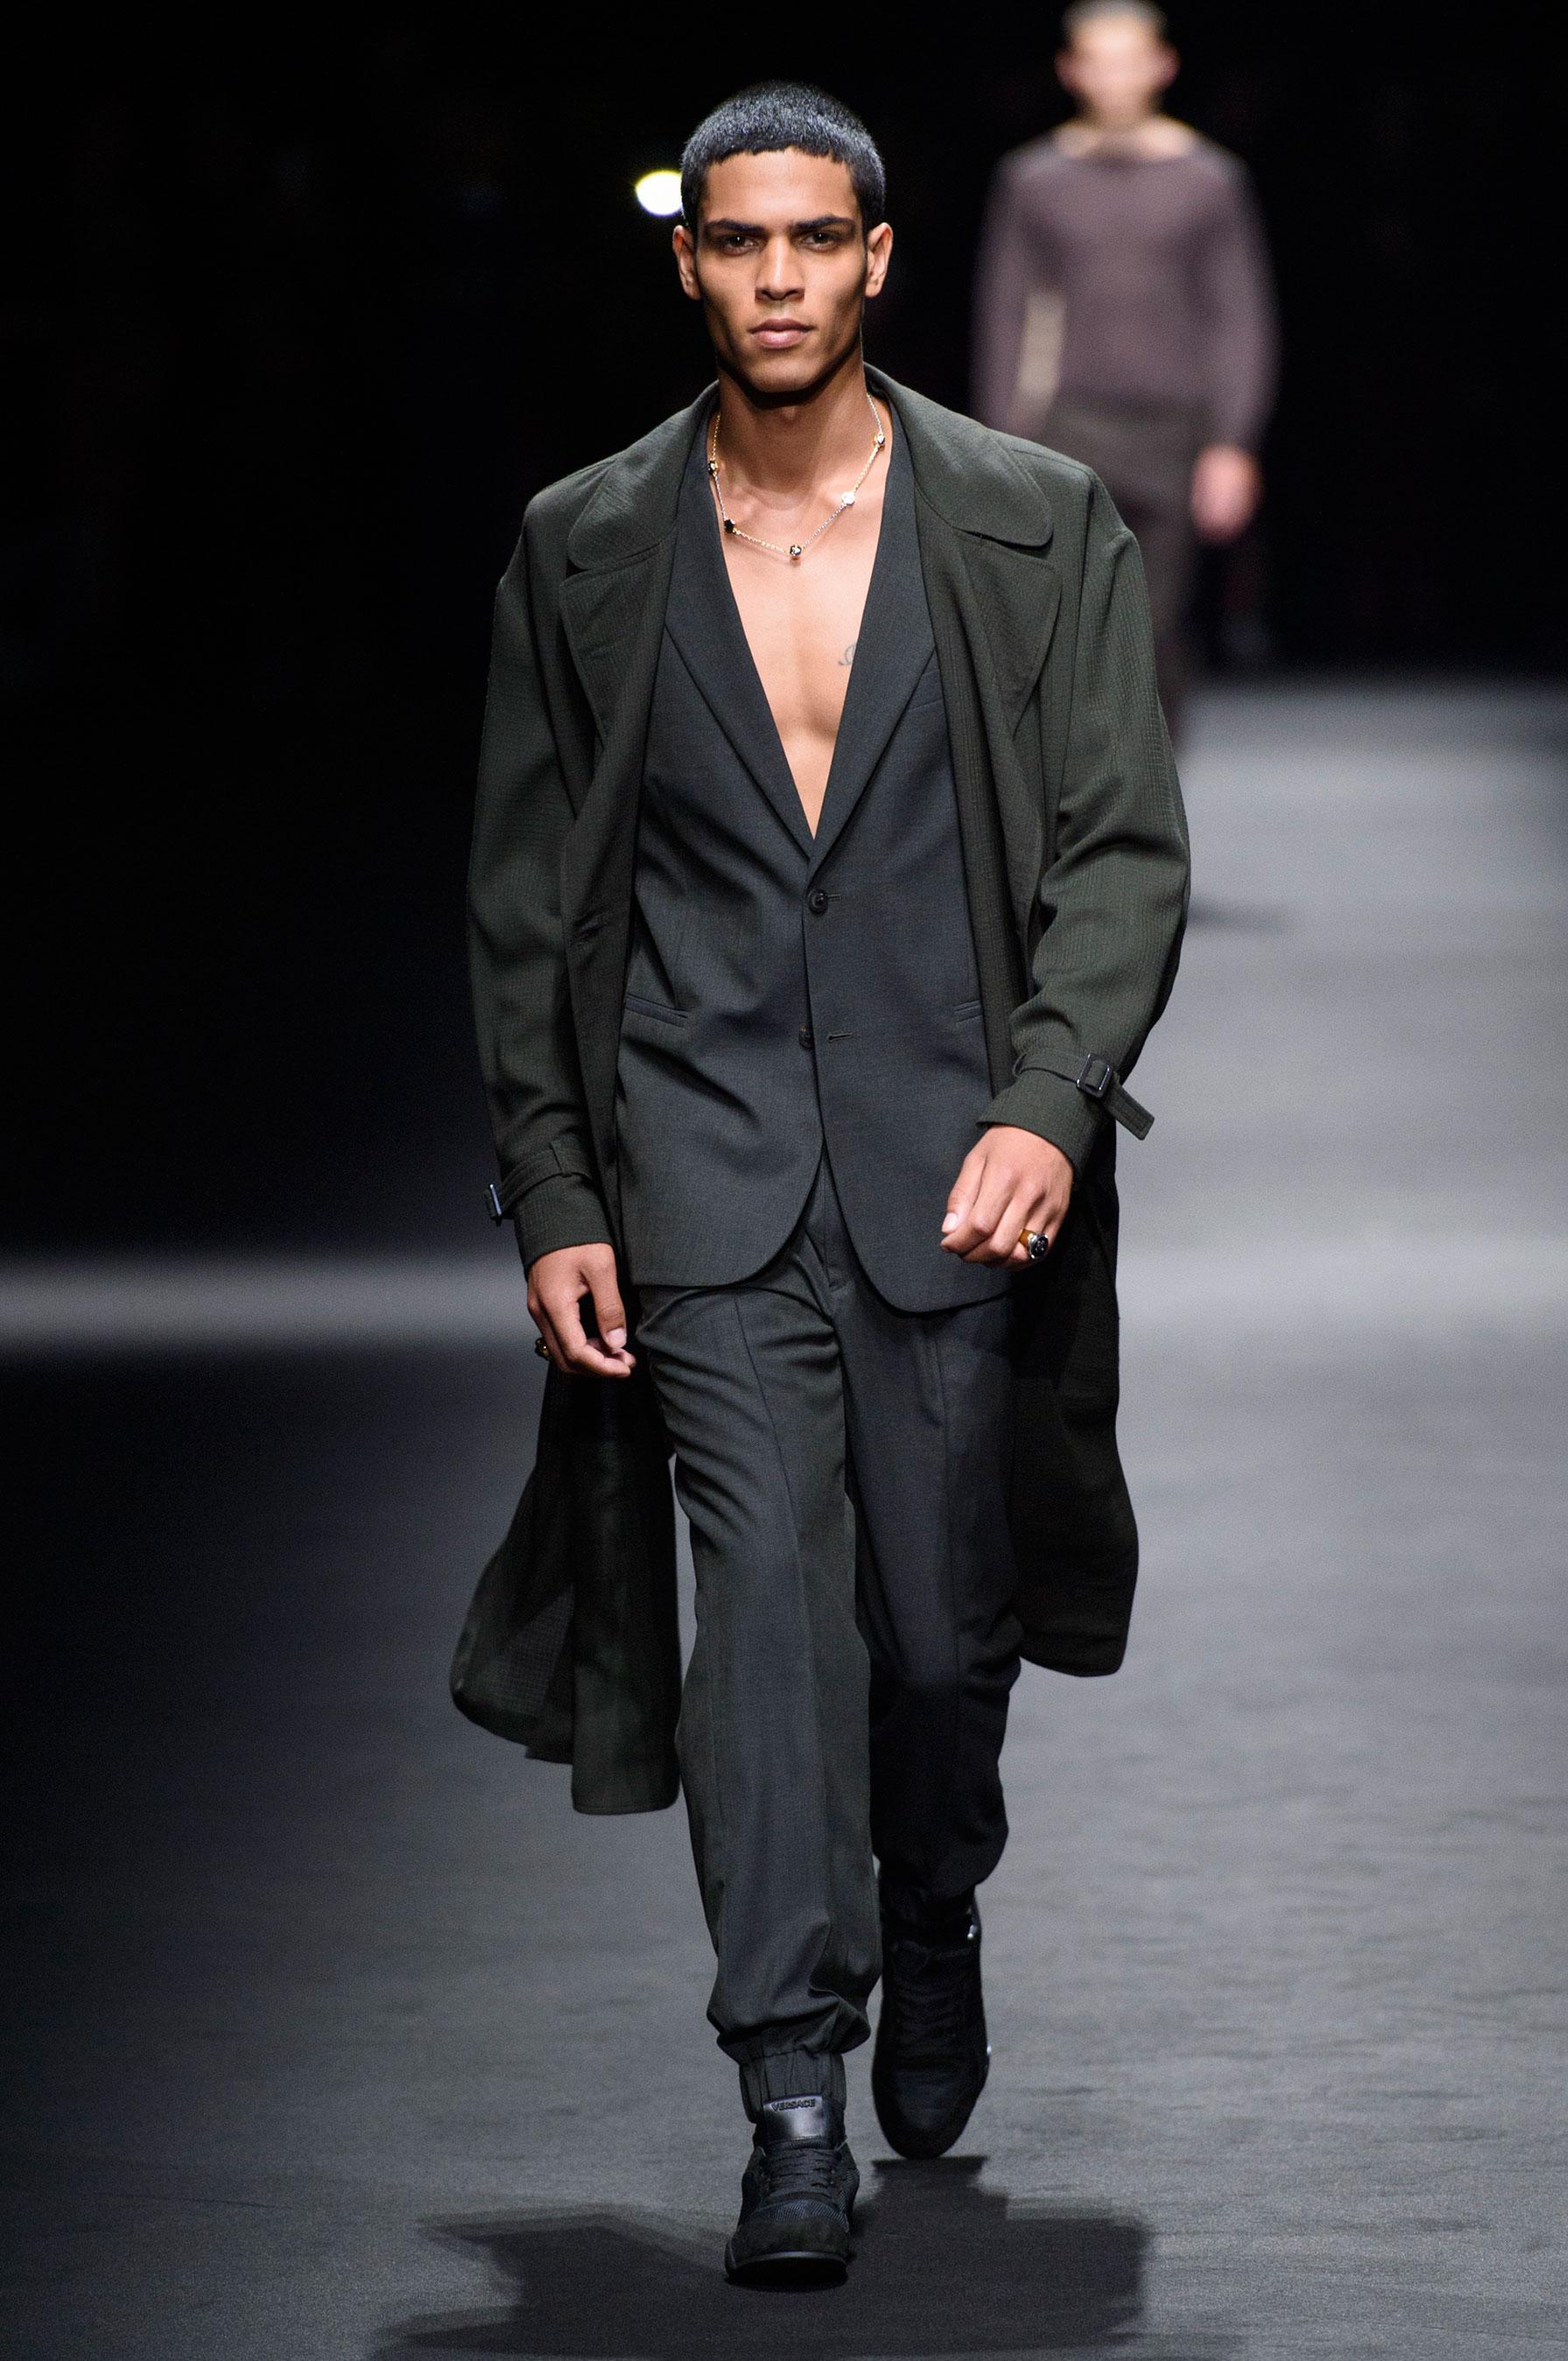 Défilé Versace Printemps-été 2017 Homme - Madame Figaro 38eebc3b341